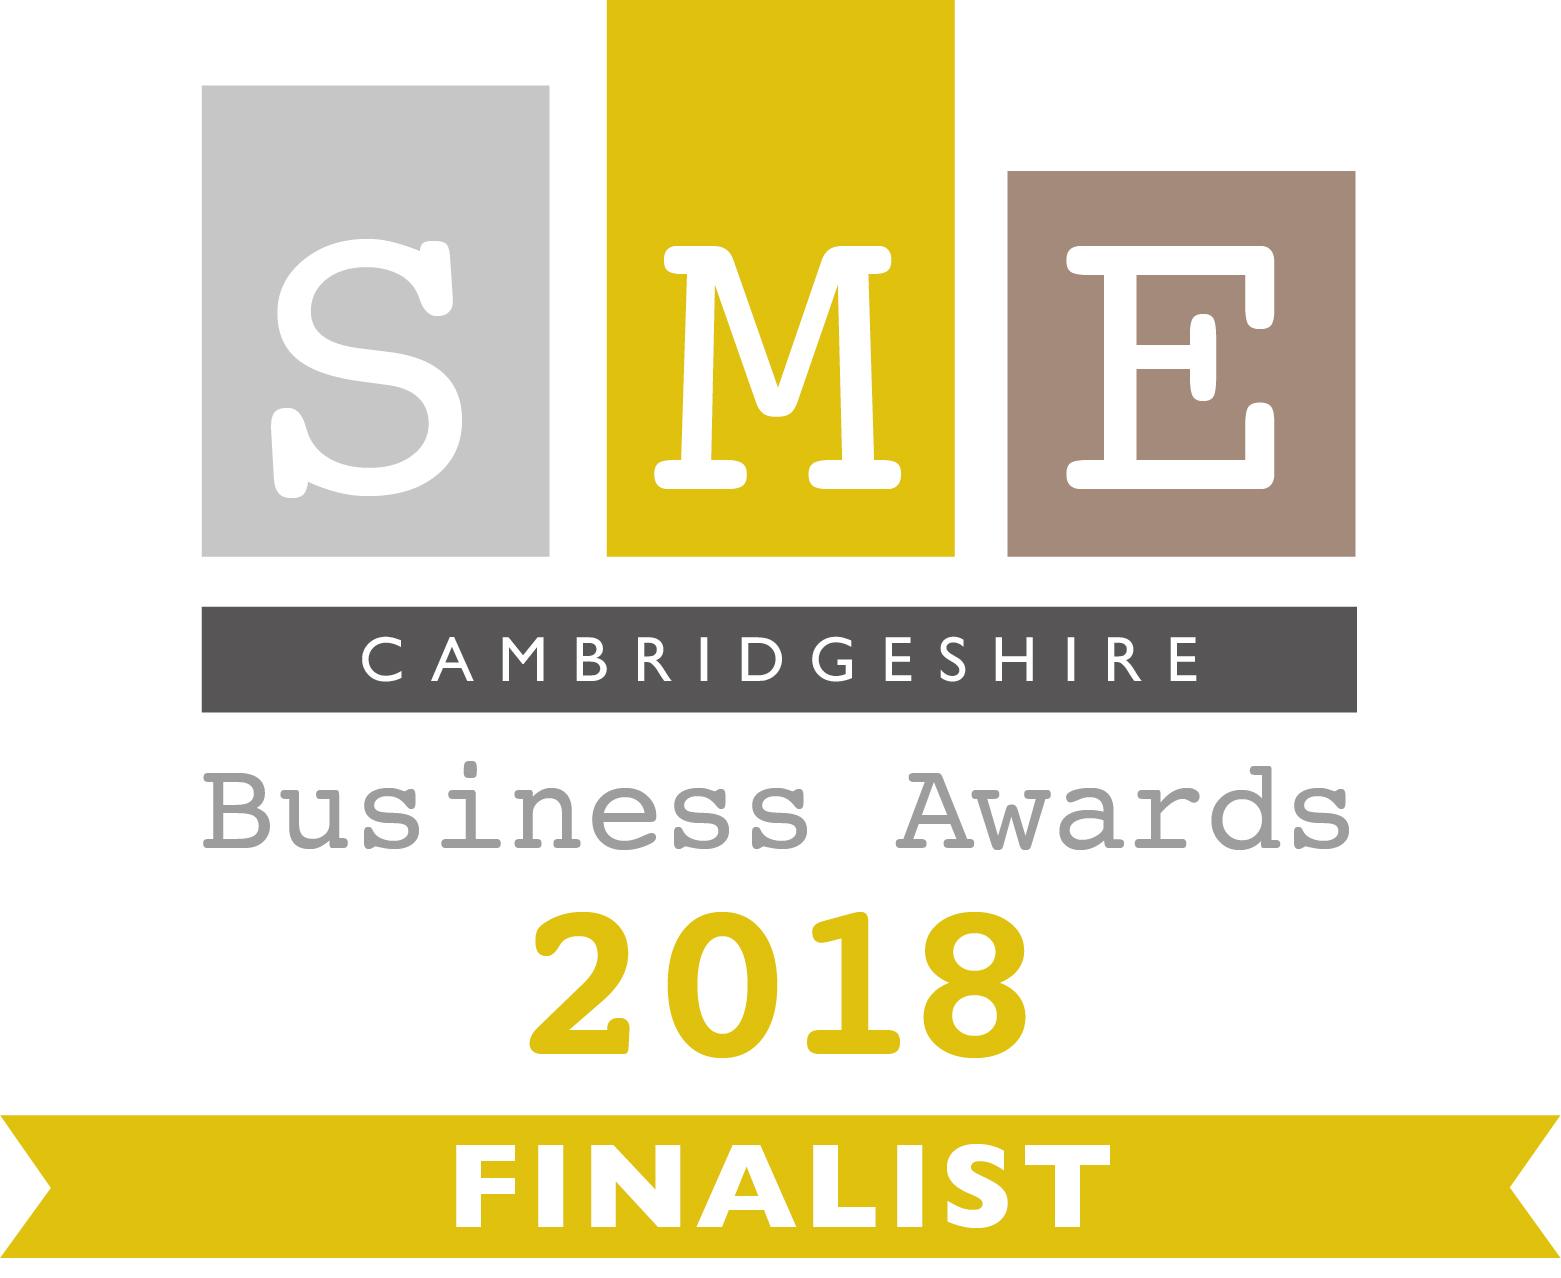 SME Cambs Business Award_Finalist_2018.jpg